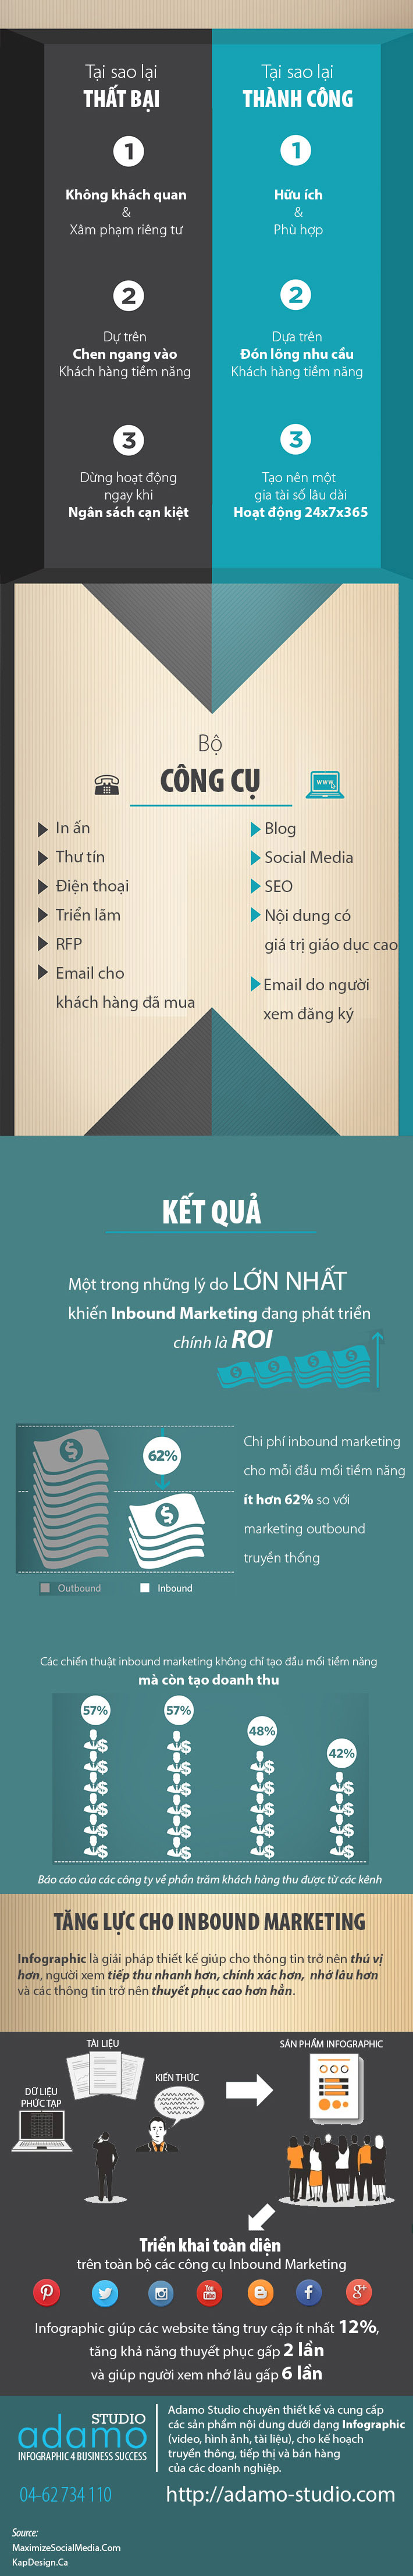 Ban-hang-B2B-infographic-adamo-studio-2